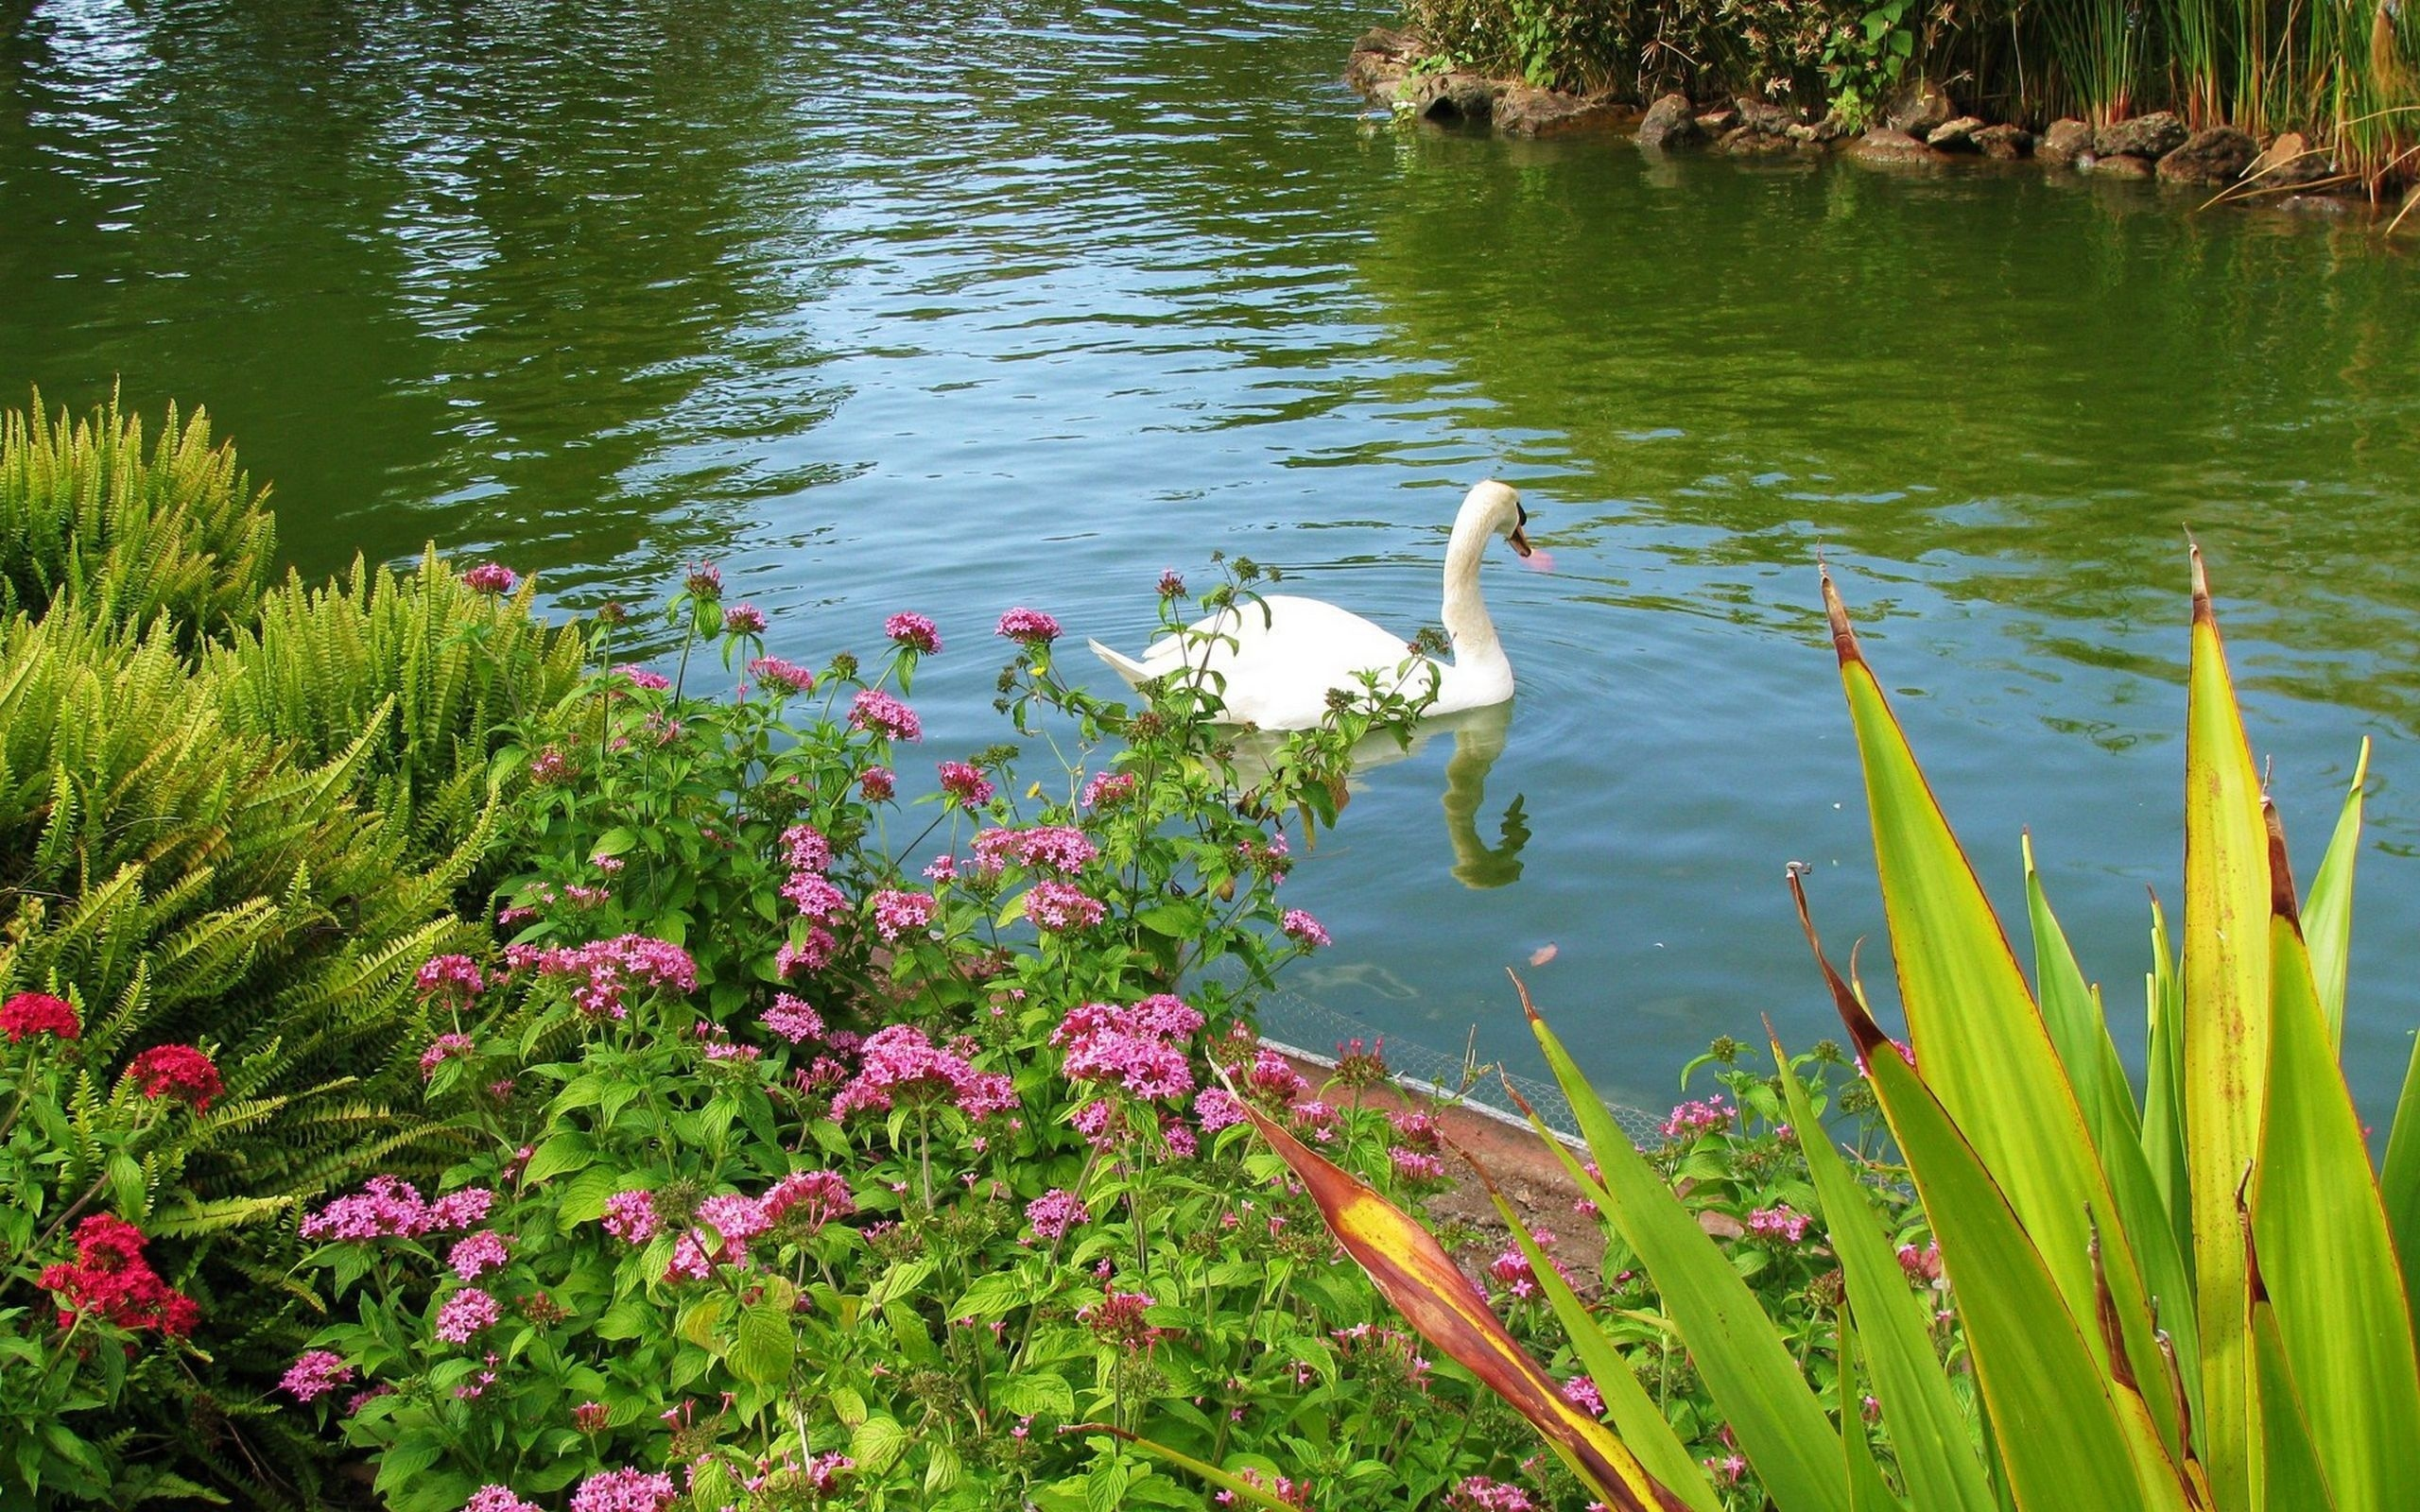 картинки с лебедями на природе рабочий стол секонд-хенда